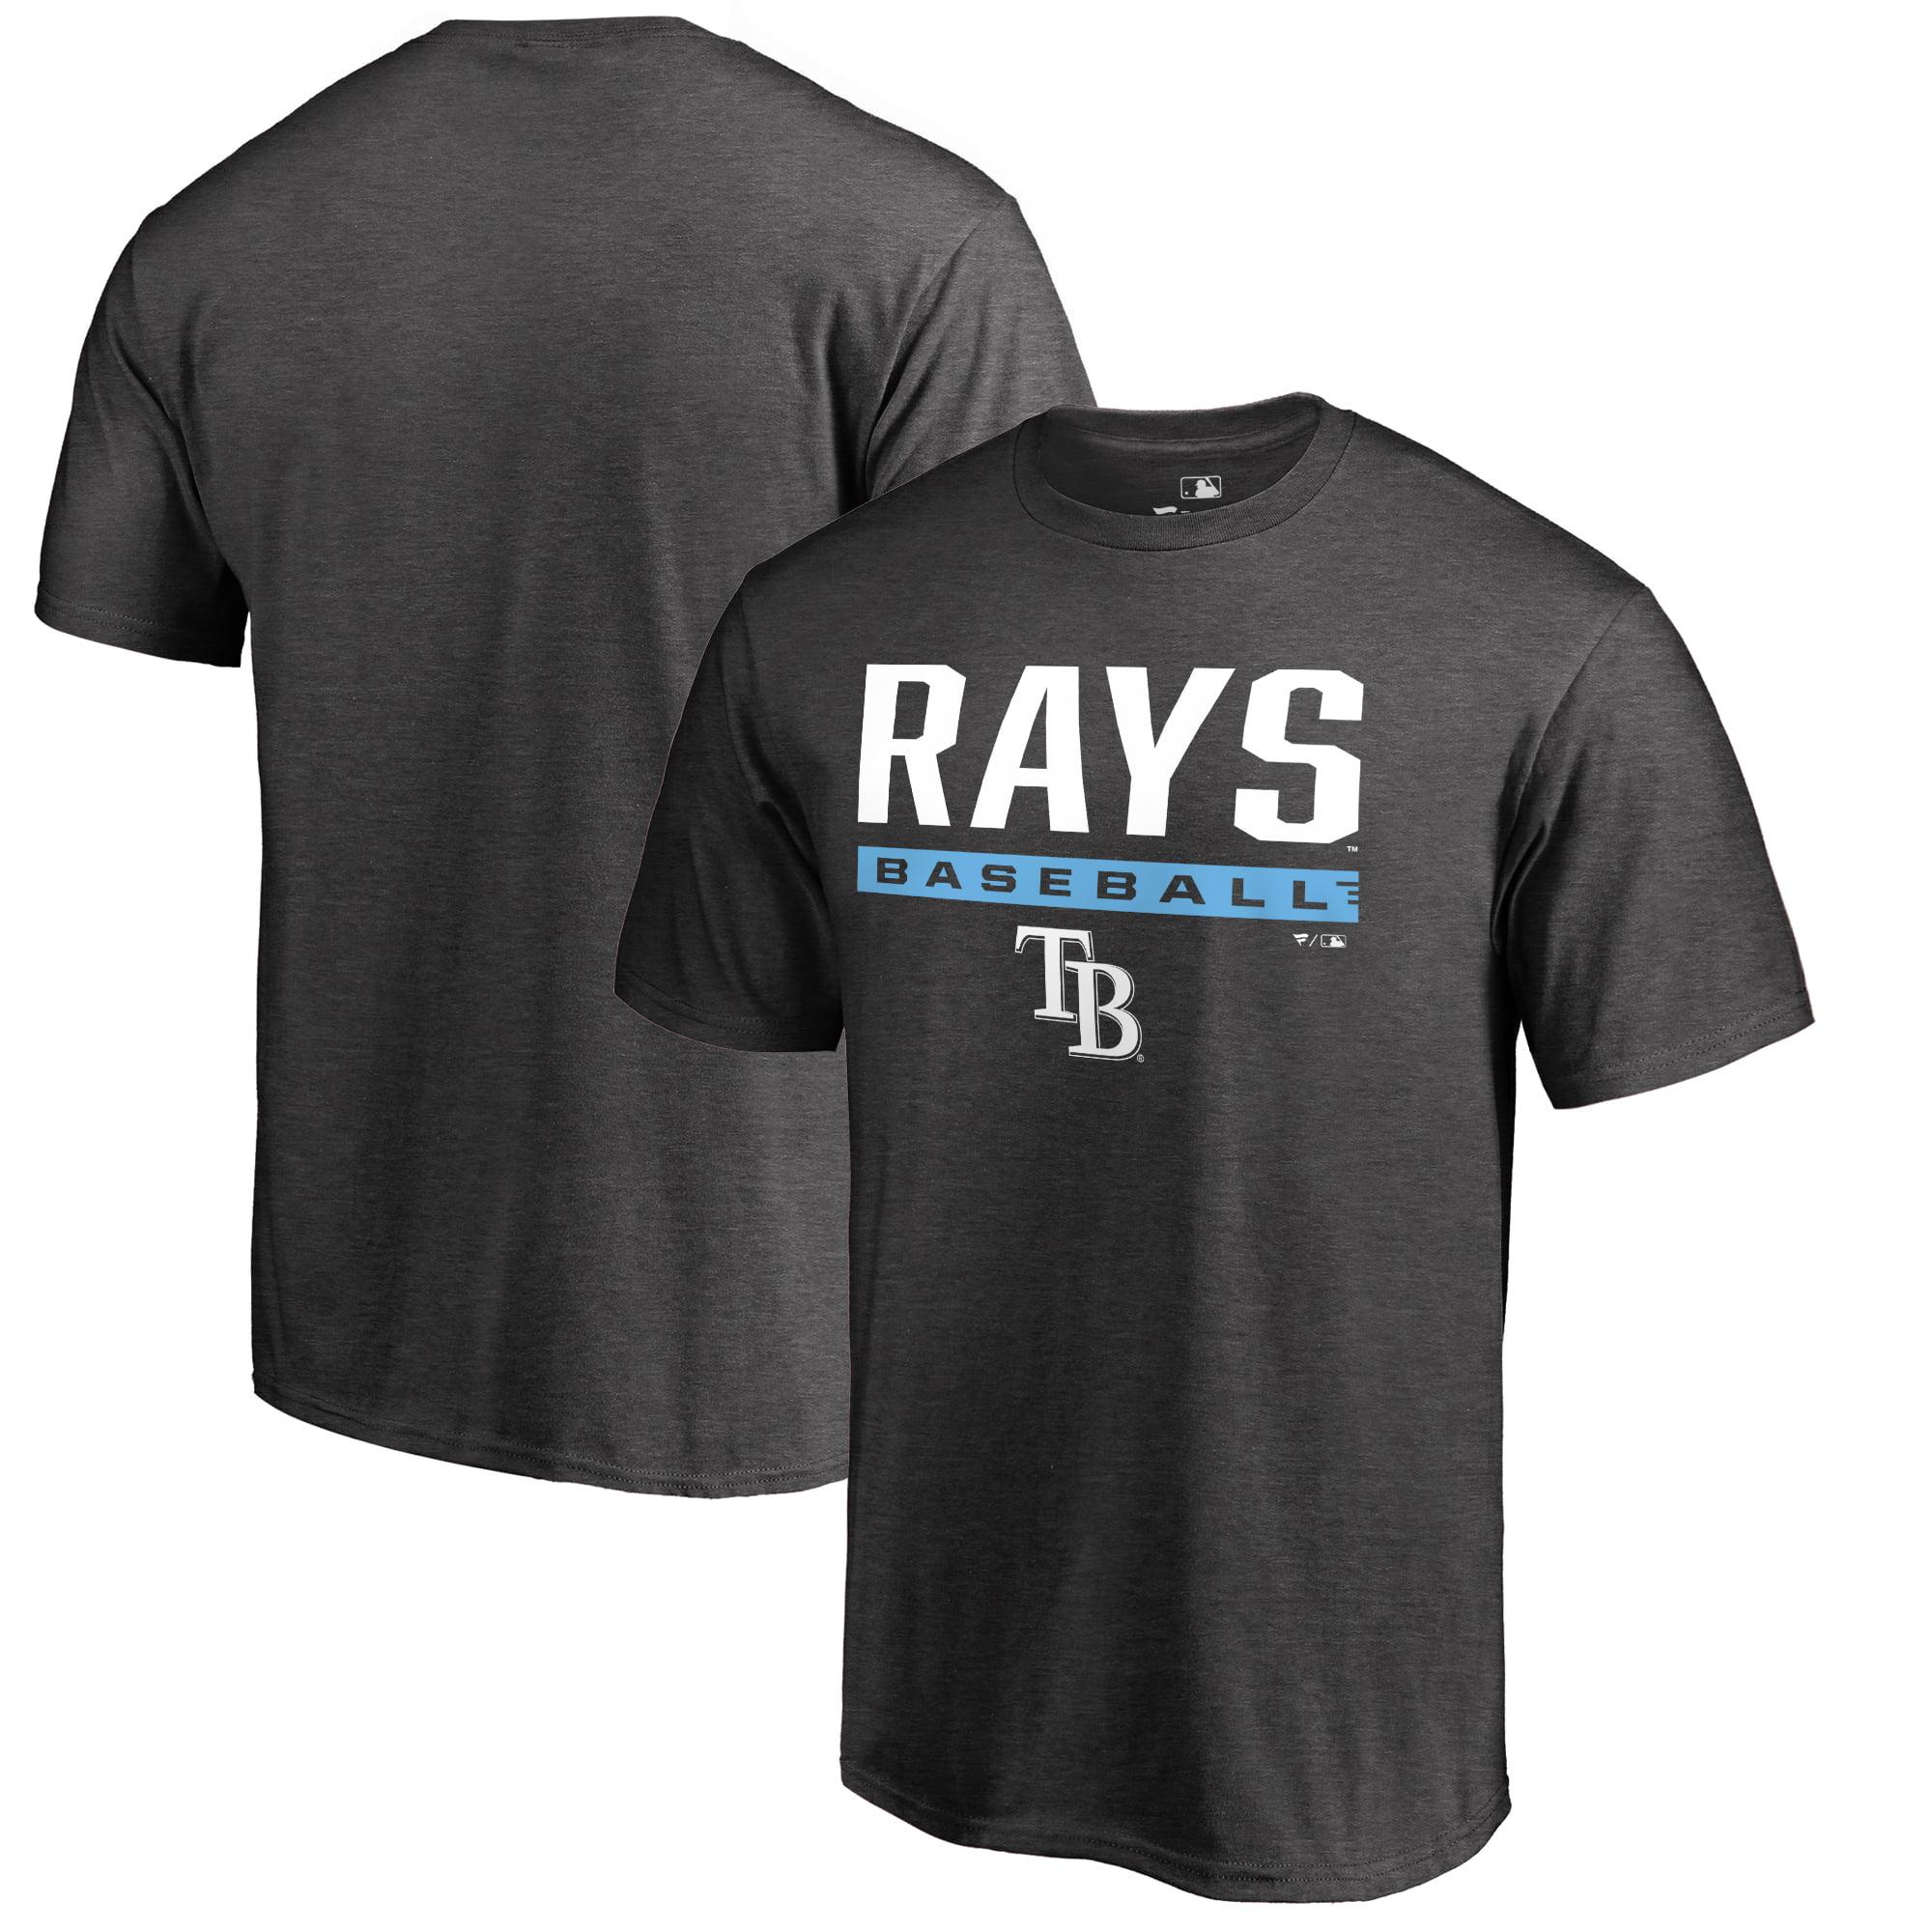 Tampa Bay Rays Fanatics Branded Win Stripe Big and Tall T-Shirt - Ash